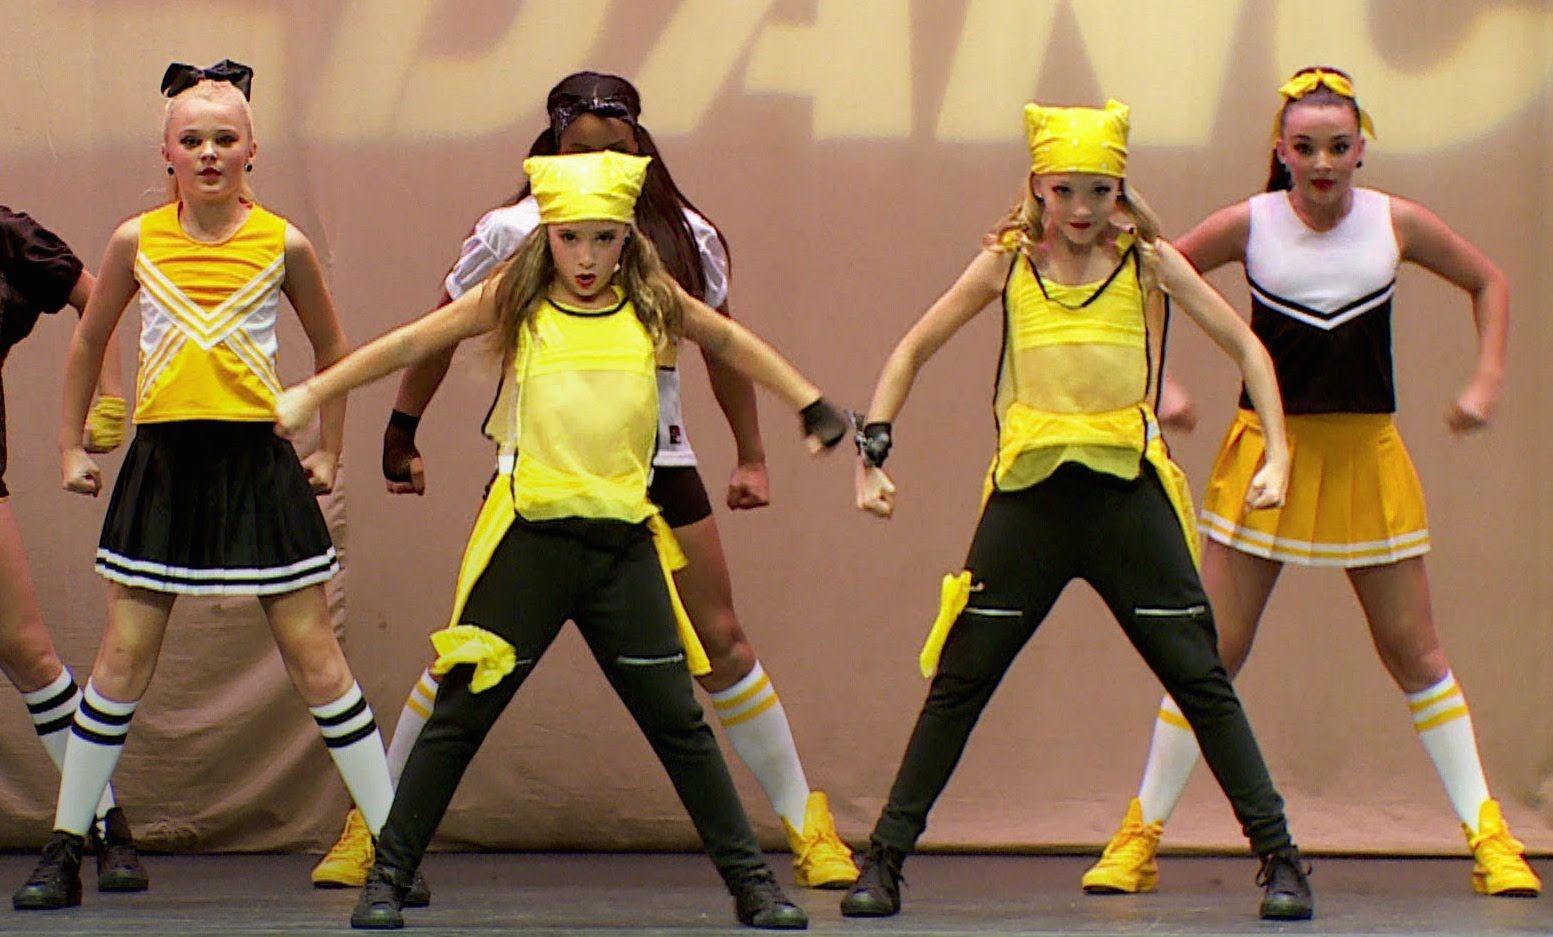 Little dancers from 'Dance Moms'